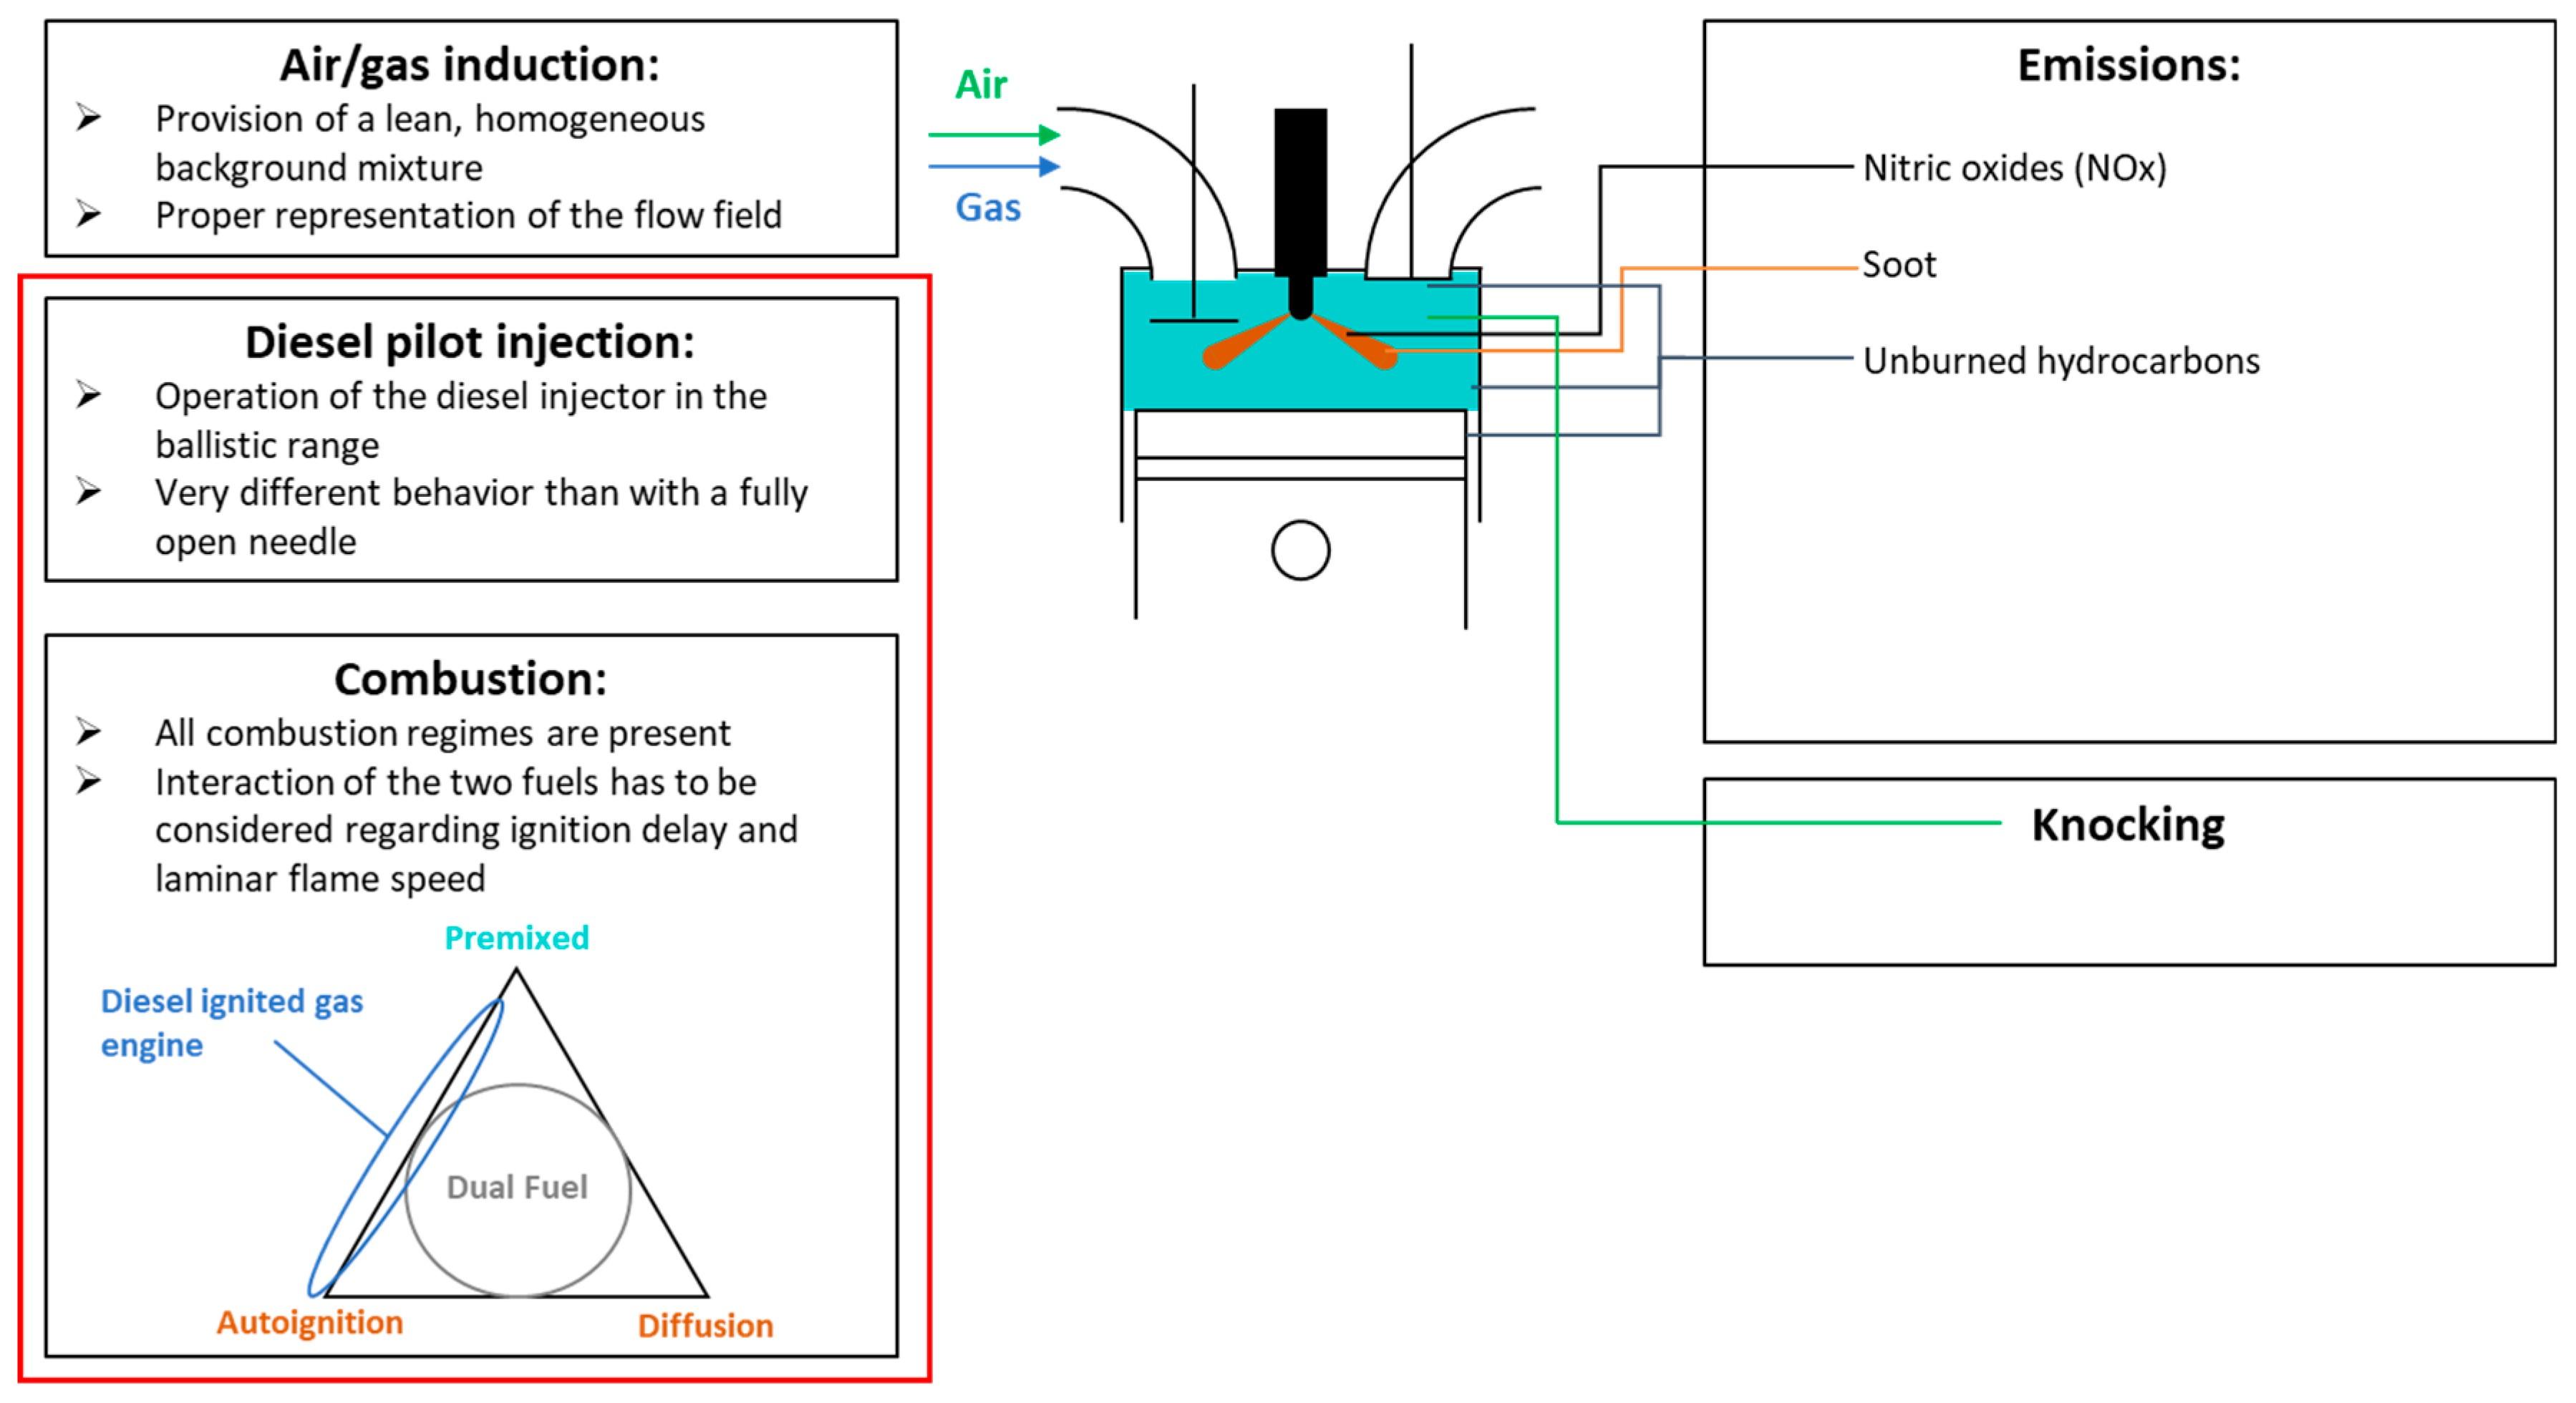 Valve Timing Diagram Of 4 Stroke Petrol Engine Energies Free Full Text Of Valve Timing Diagram Of 4 Stroke Petrol Engine